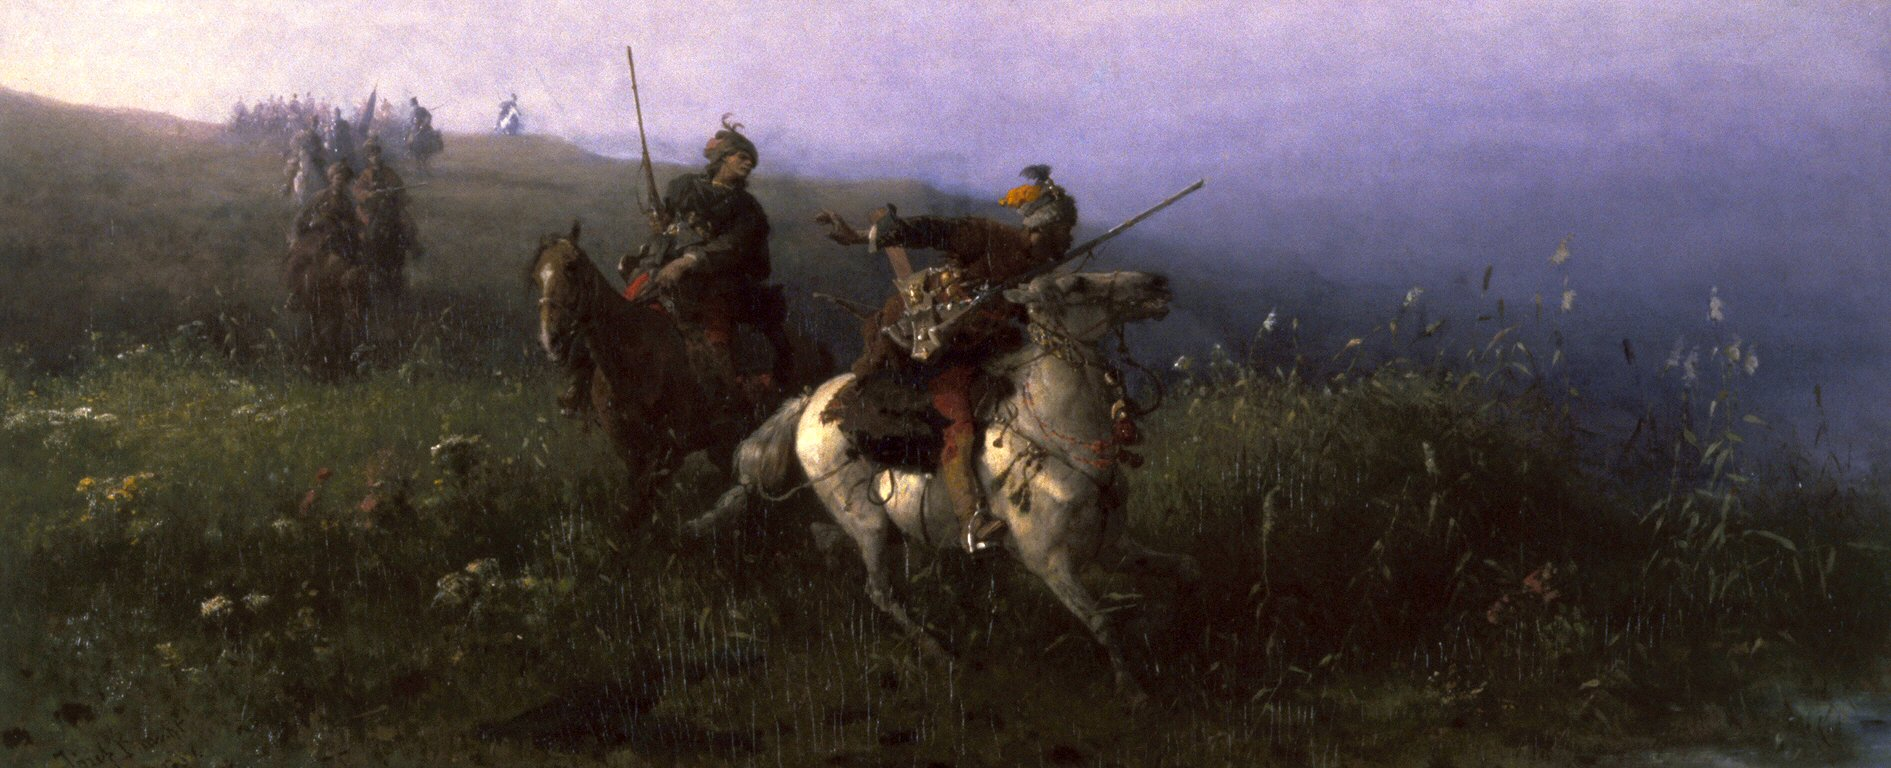 Tropa de jinetes tártaros en la estepa de Tartaristán. Józef_Brandt (1841-1915)